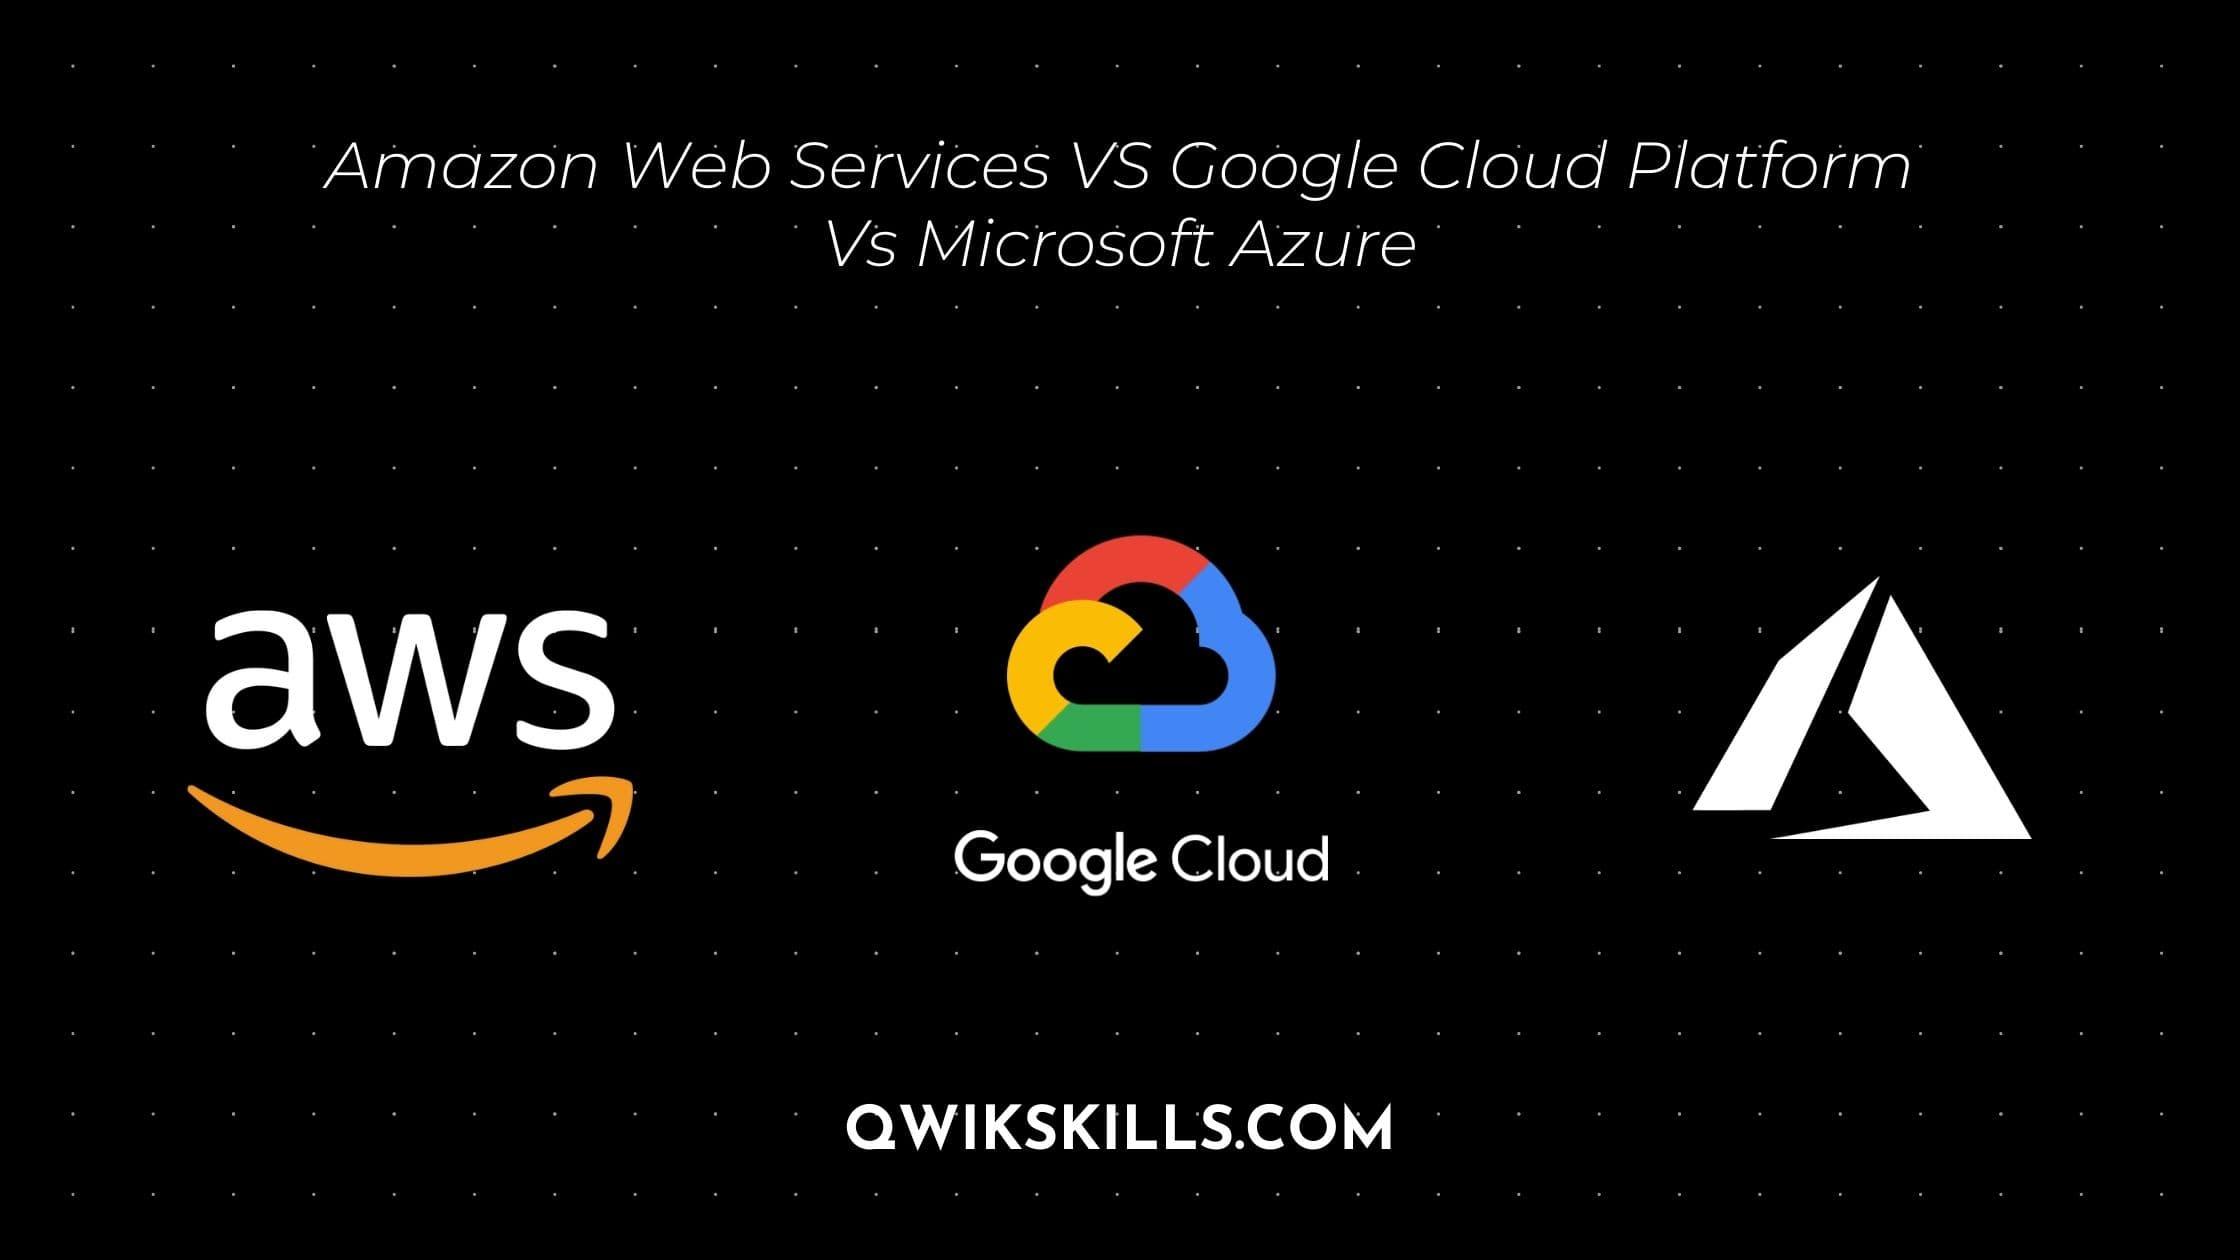 amazon web services- What is Amazon Web Services?